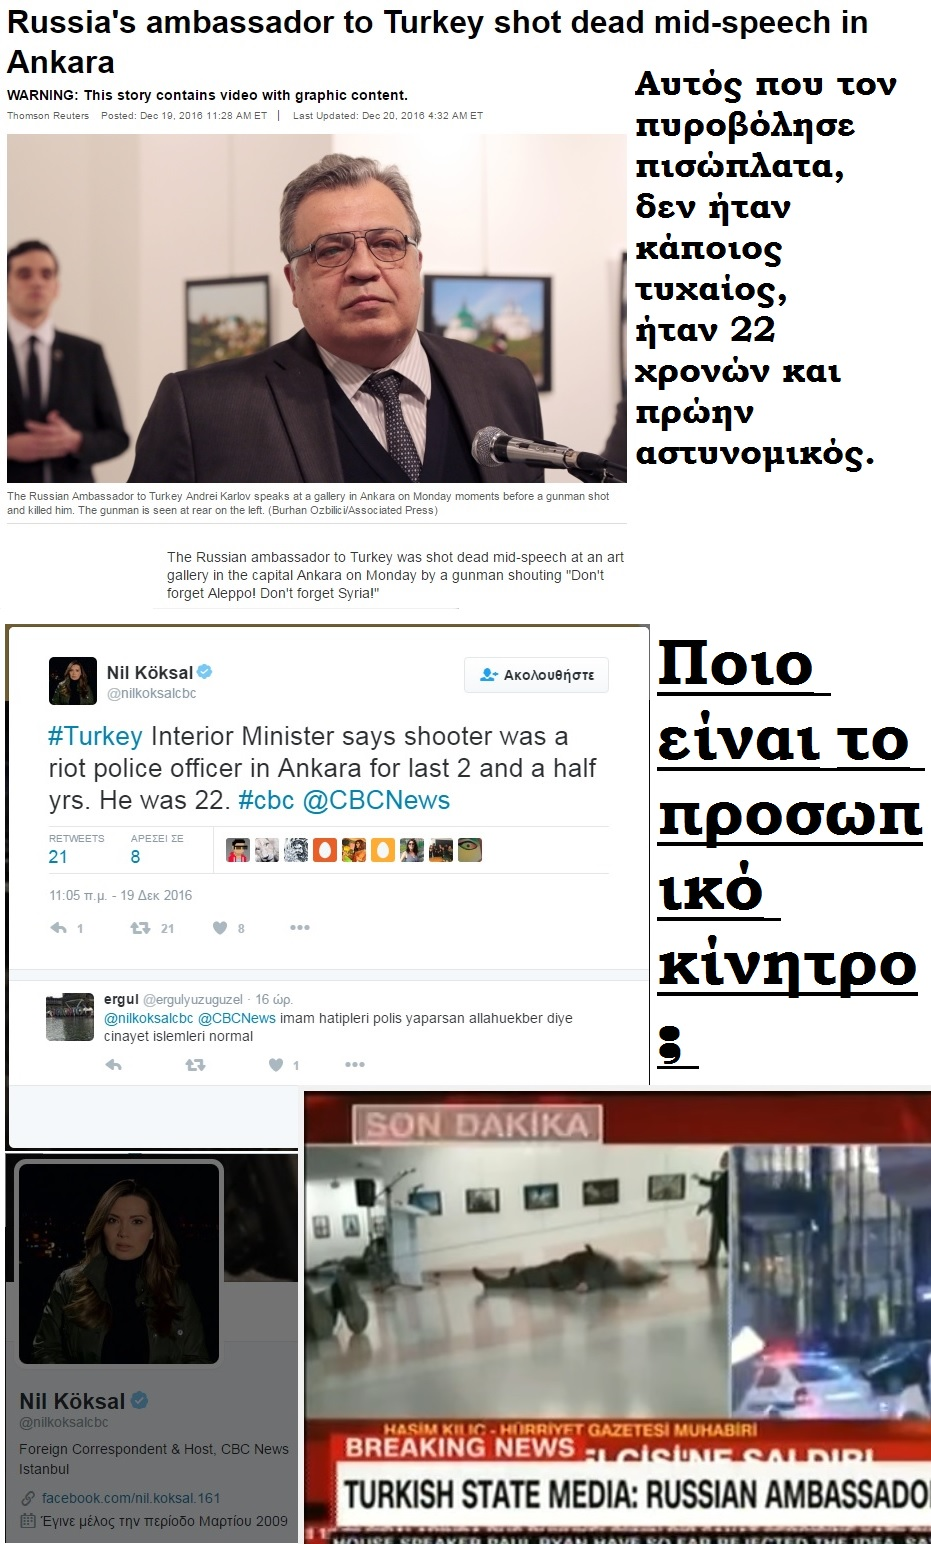 turkey-russia-ambassador-shot-death-ankara-aleppo-terror-07-201216